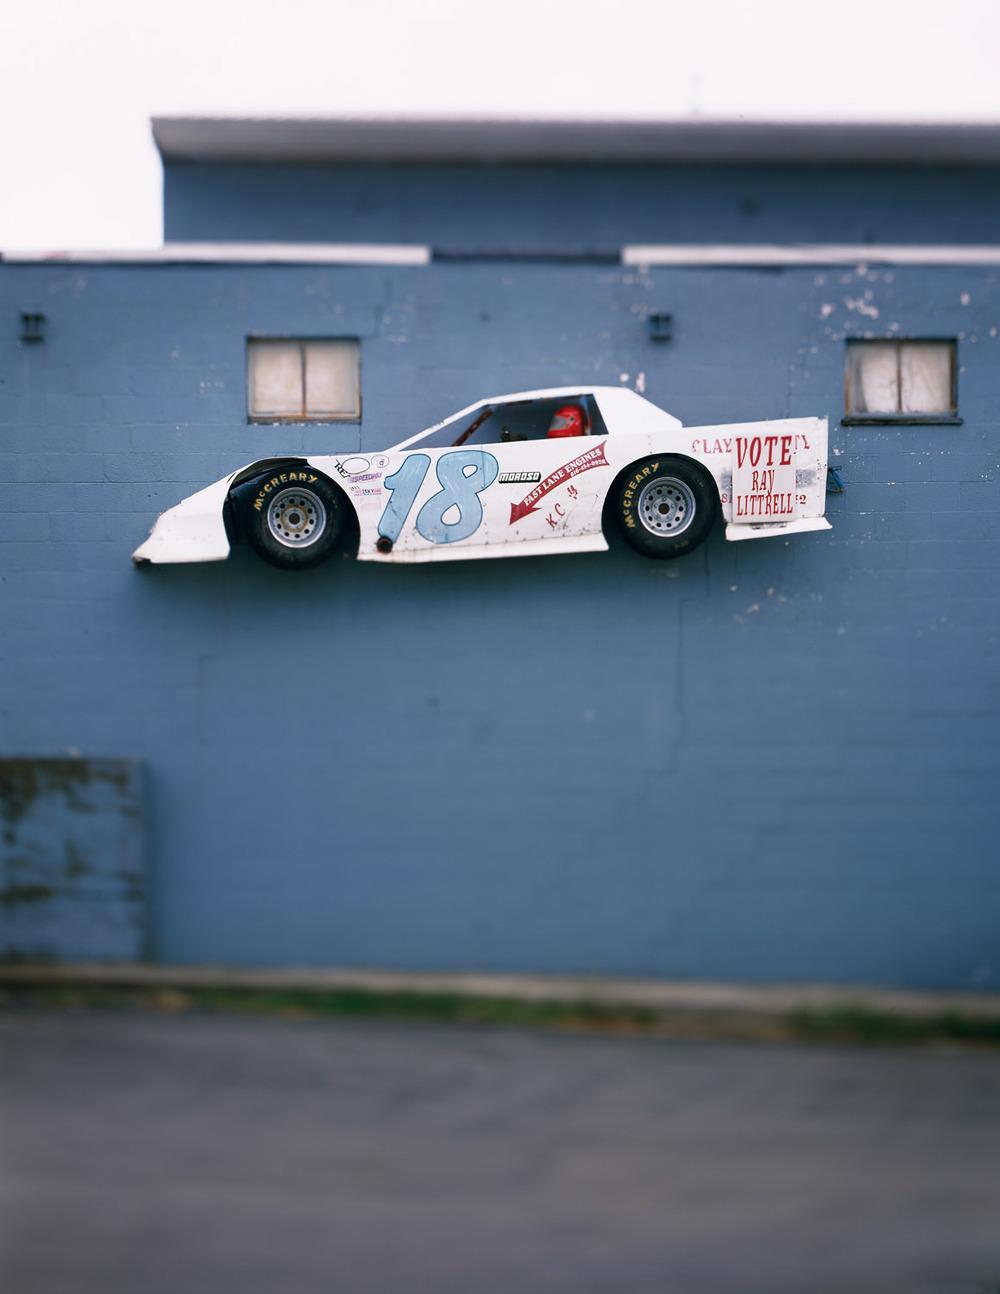 Car on Wall